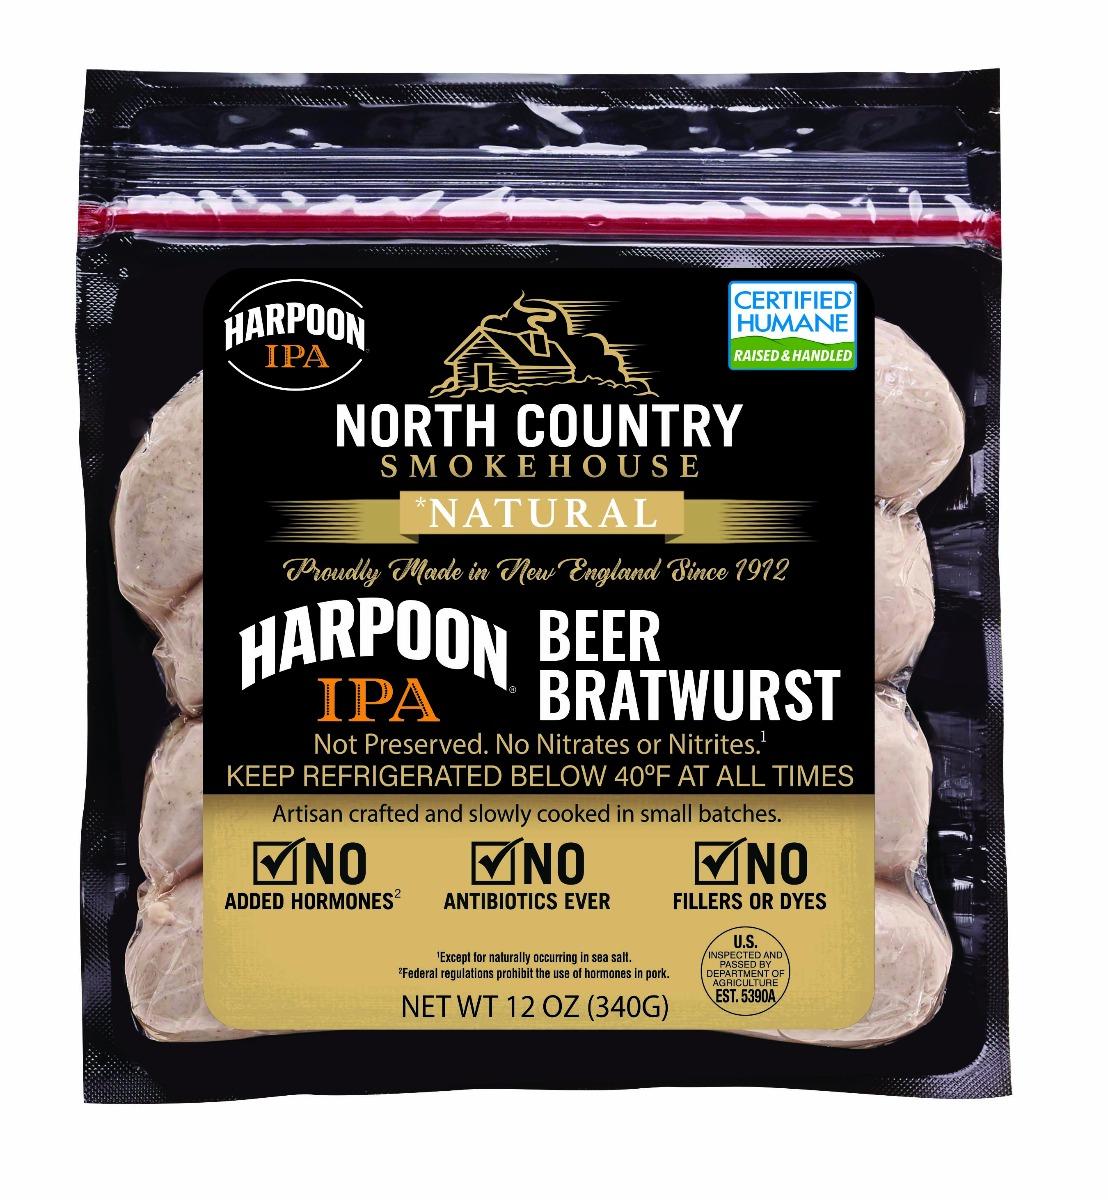 Natural Harpoon IPA Beer Bratwurst Sausage - 3, 12 oz. packages